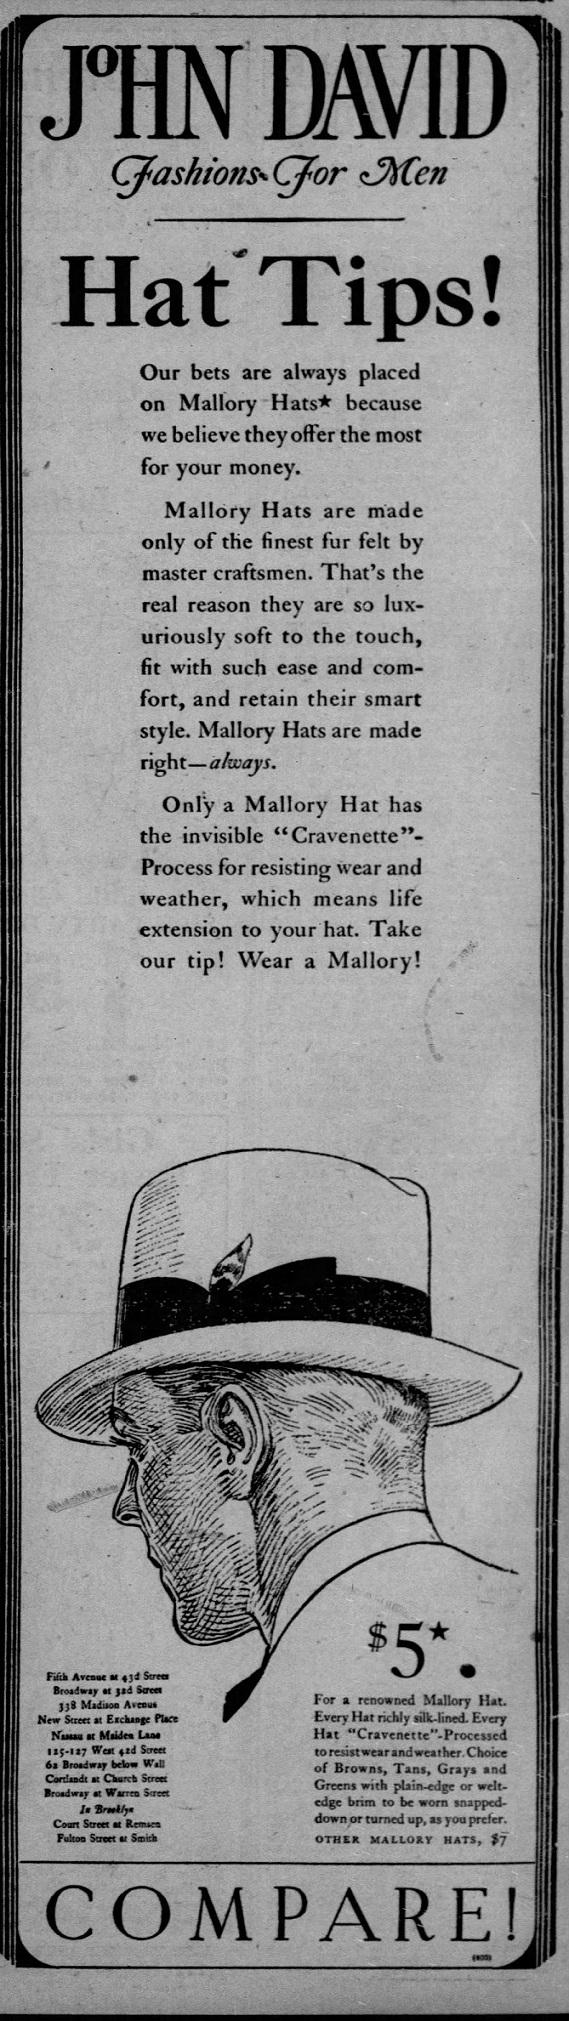 Daily_News_Thu__Mar_24__1932_ (1).jpg